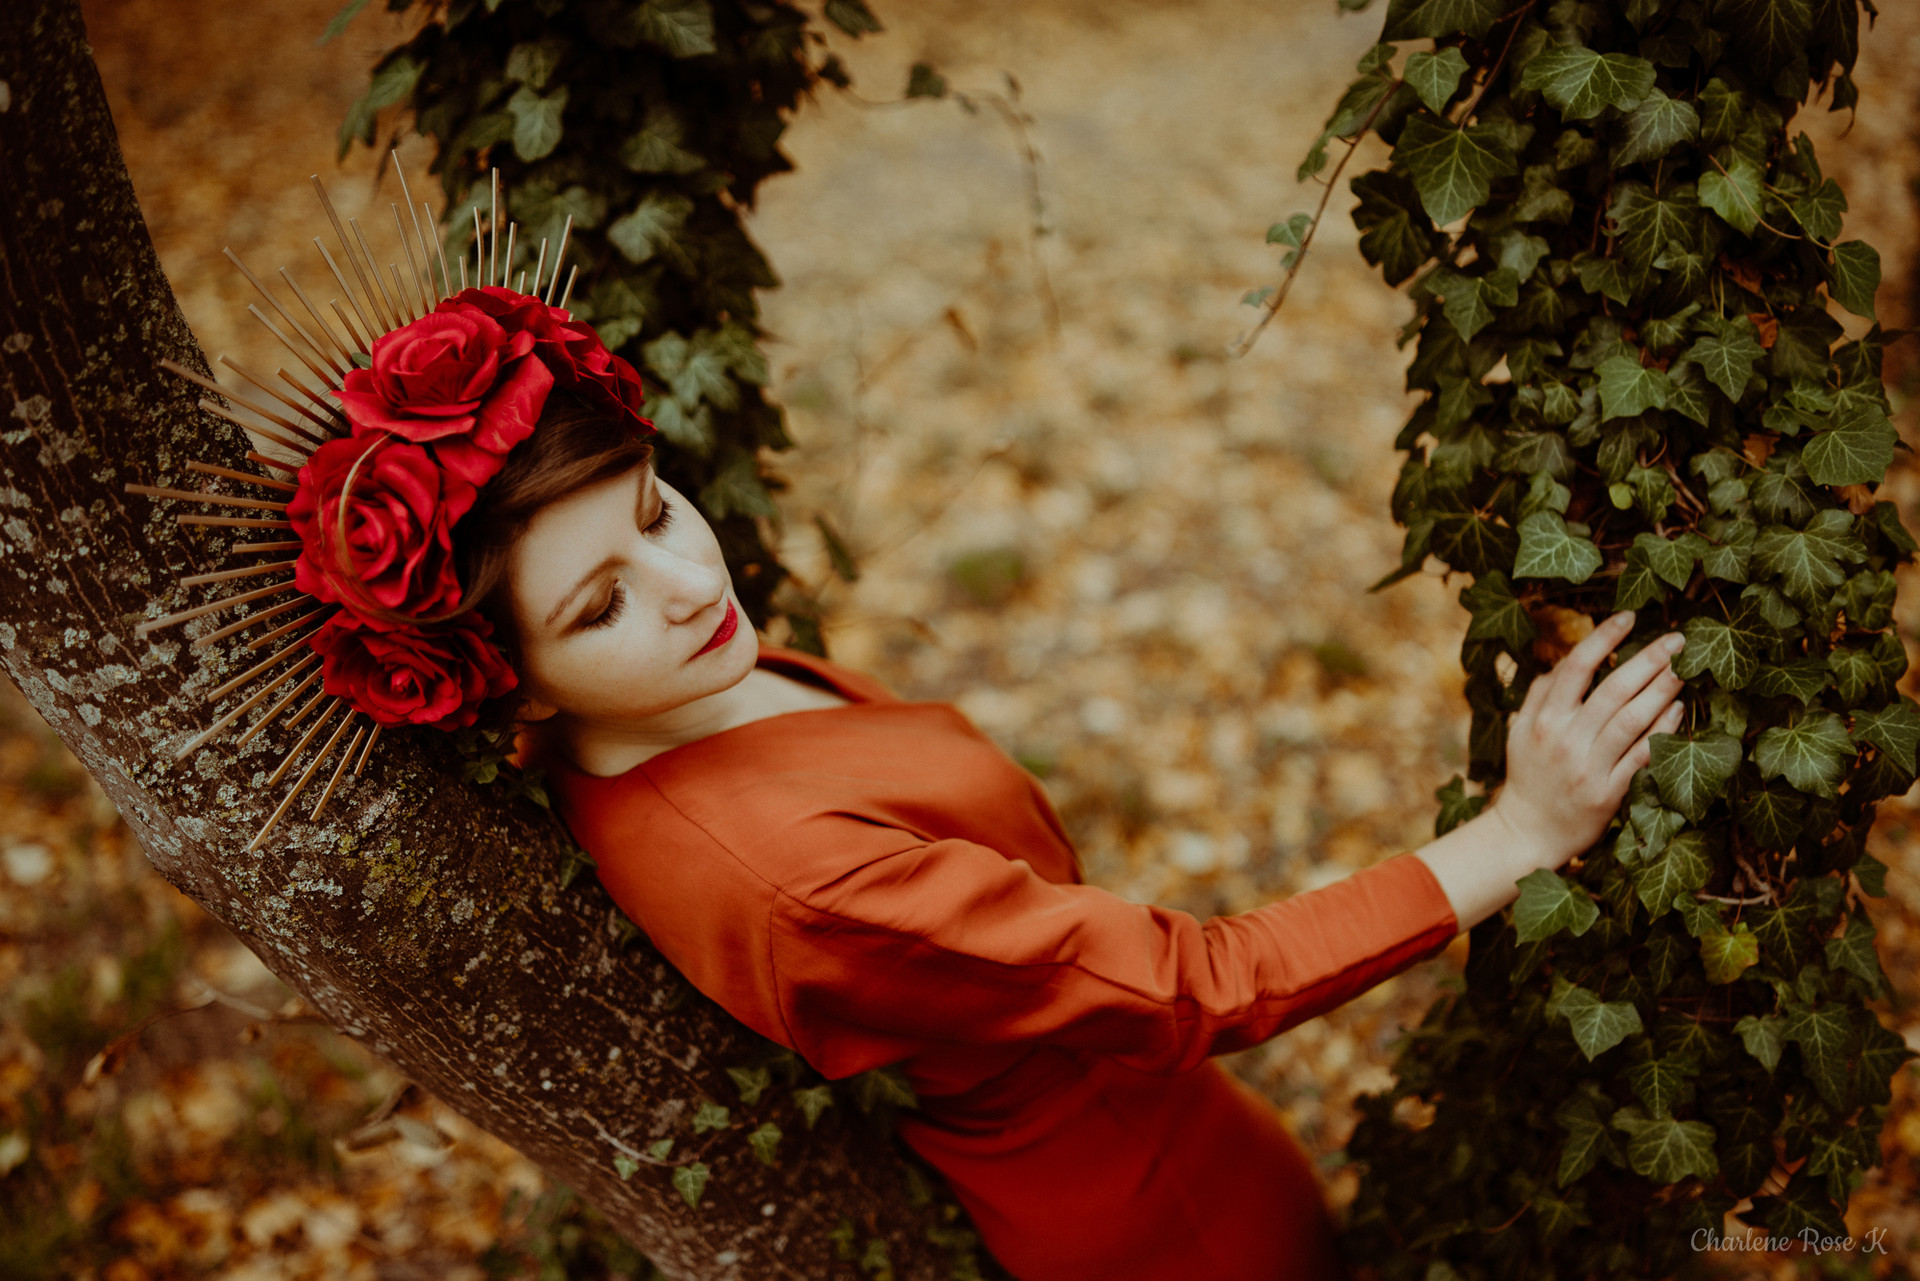 seance-photo-troyes-solo-femme-exterieur-automne-crk-7